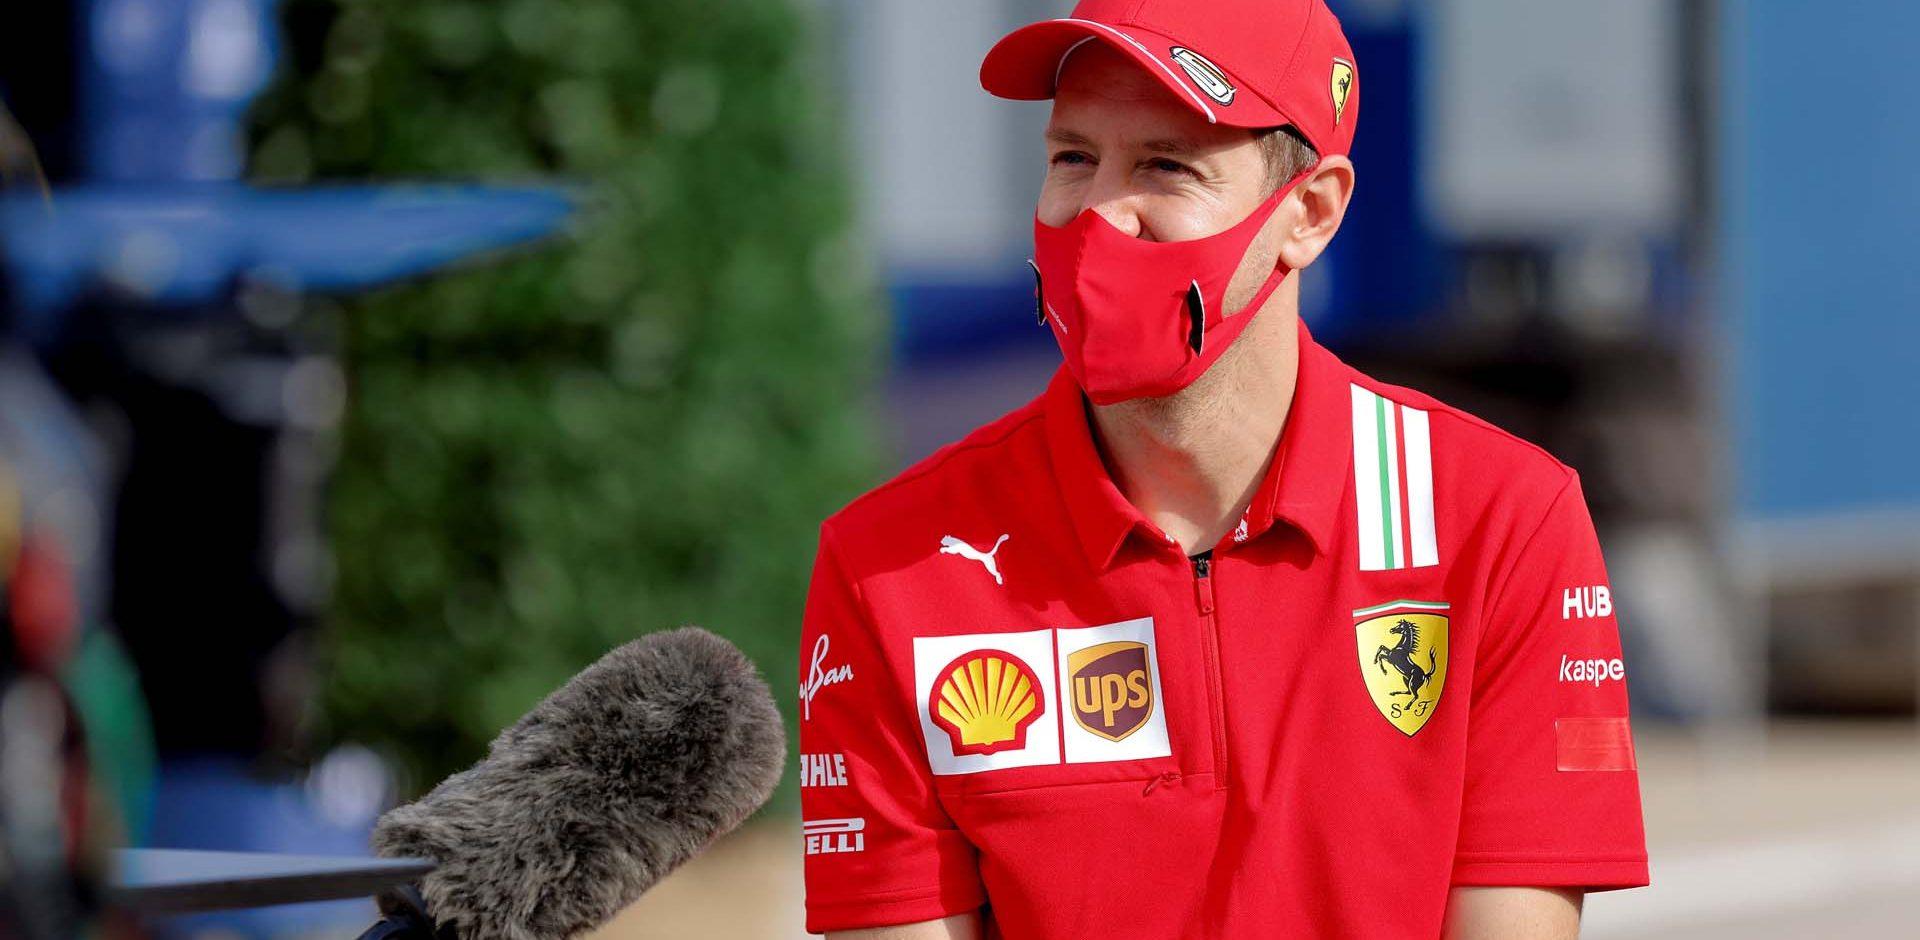 GP TURCHIA  F1/2020 -  GIOVEDÌ 12/11/2020    credit: @Scuderia Ferrari Press Office Sebastian Vettel